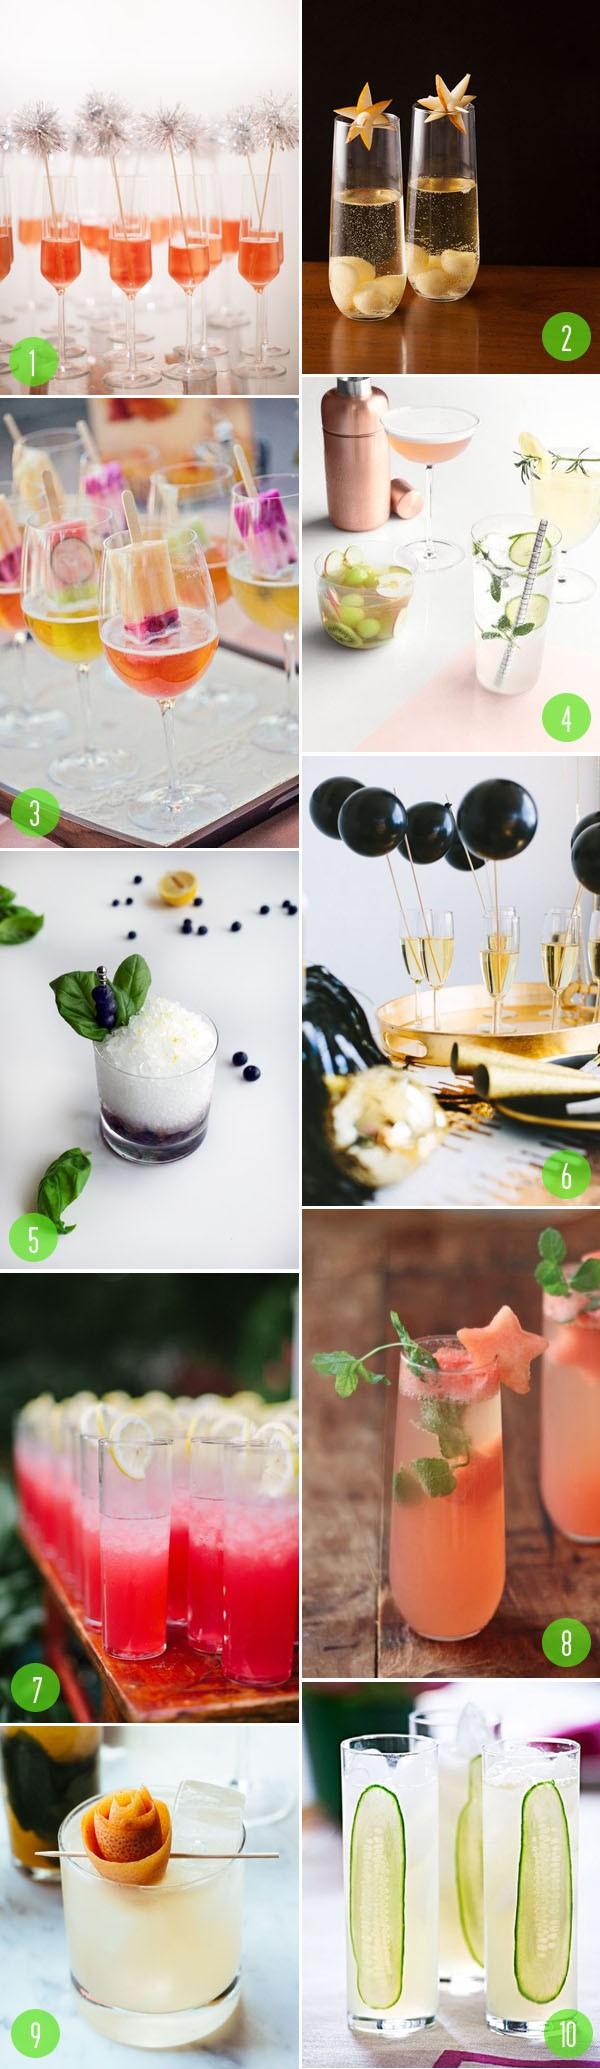 top 10: signature drinks